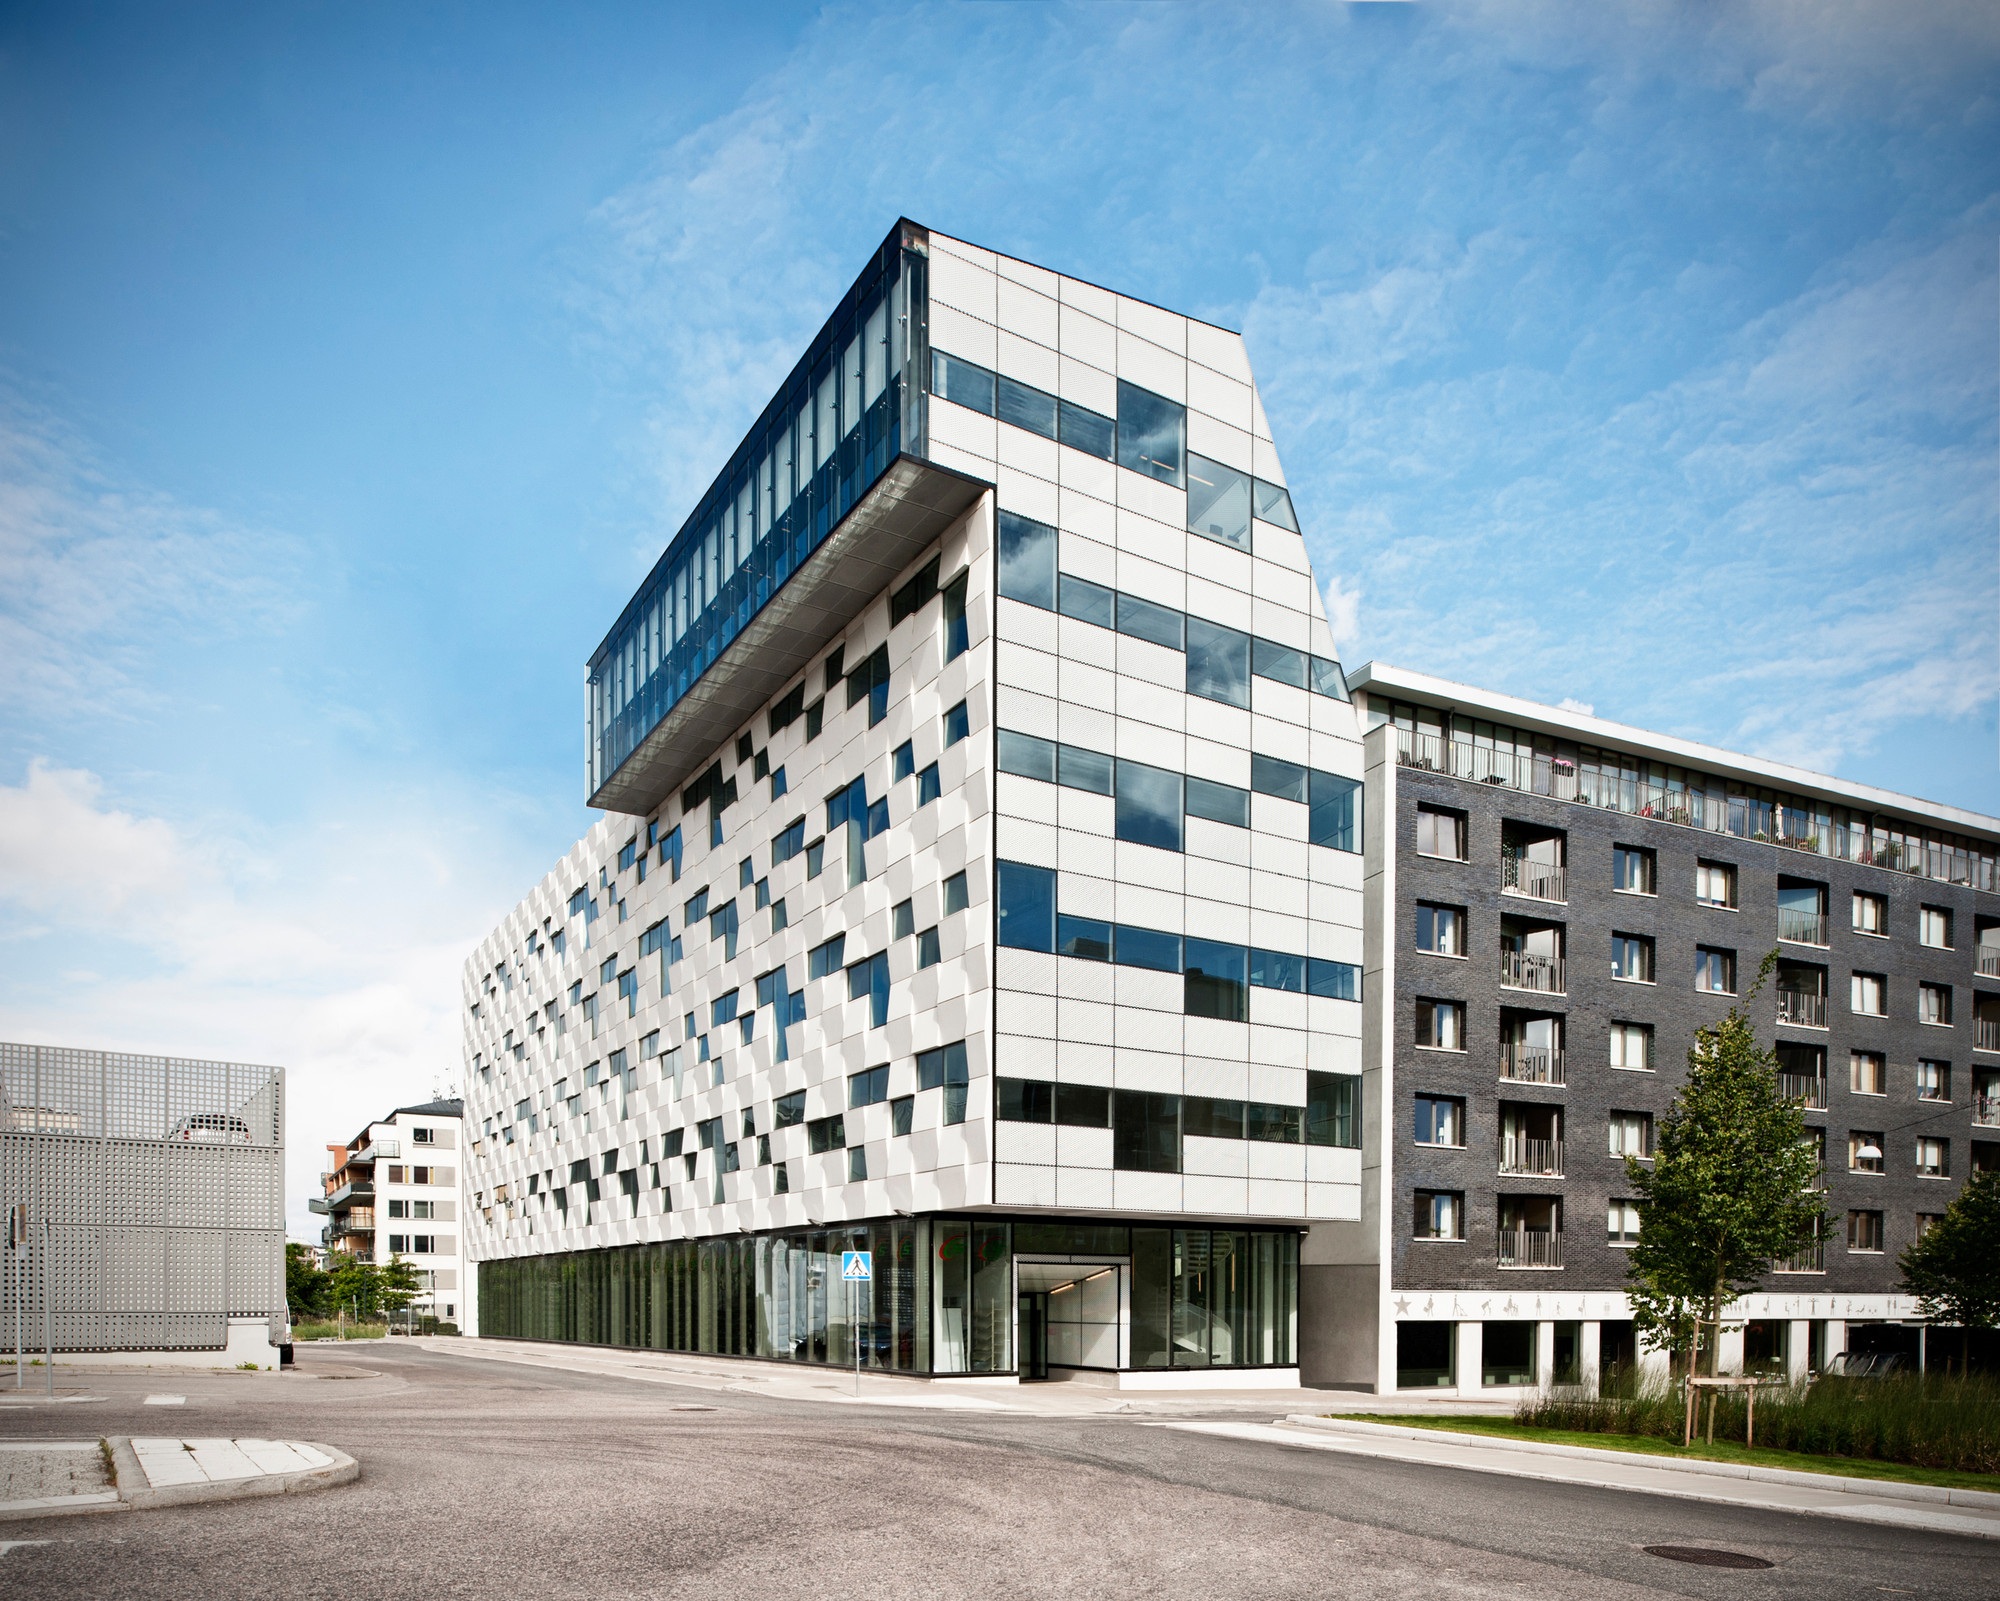 Mältaren Office Building / Rosenbergs Arkitekter, © Axel Kårfors, Tord-Rikard Söderström